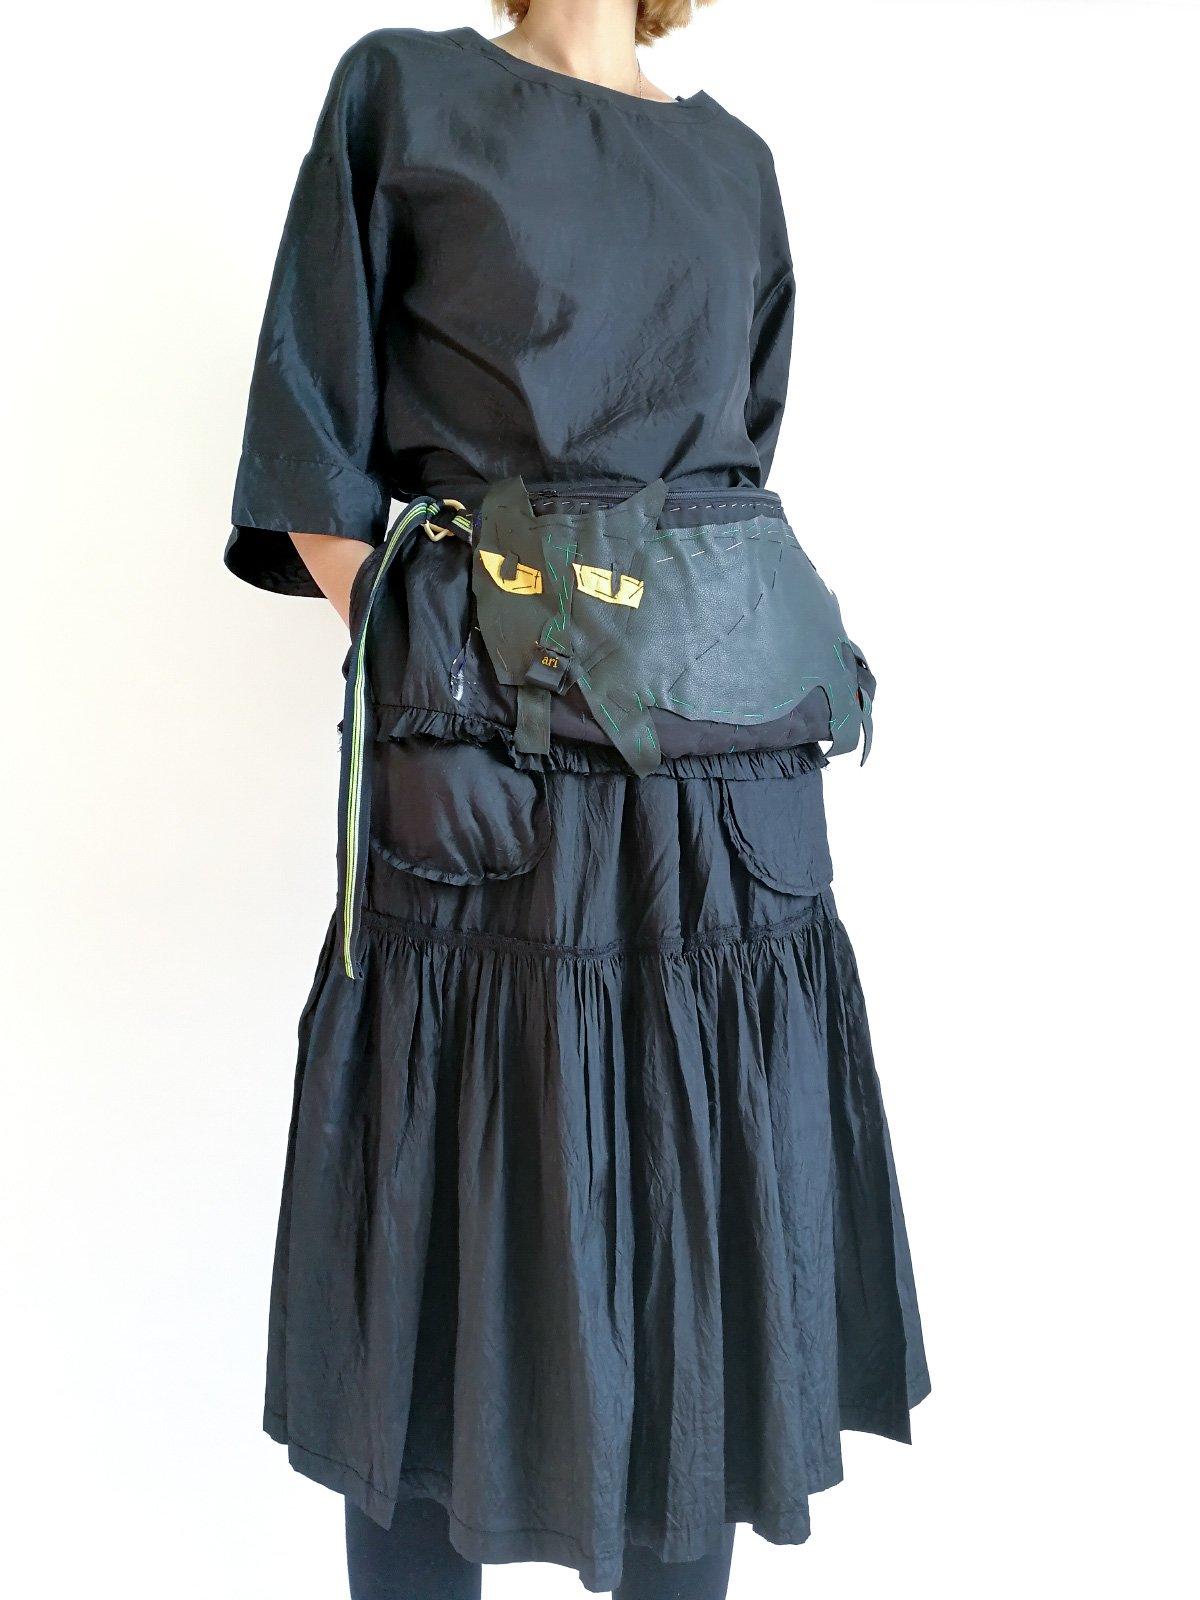 ari×mamarobot / Black Skirt with Cat Bag サムネイル